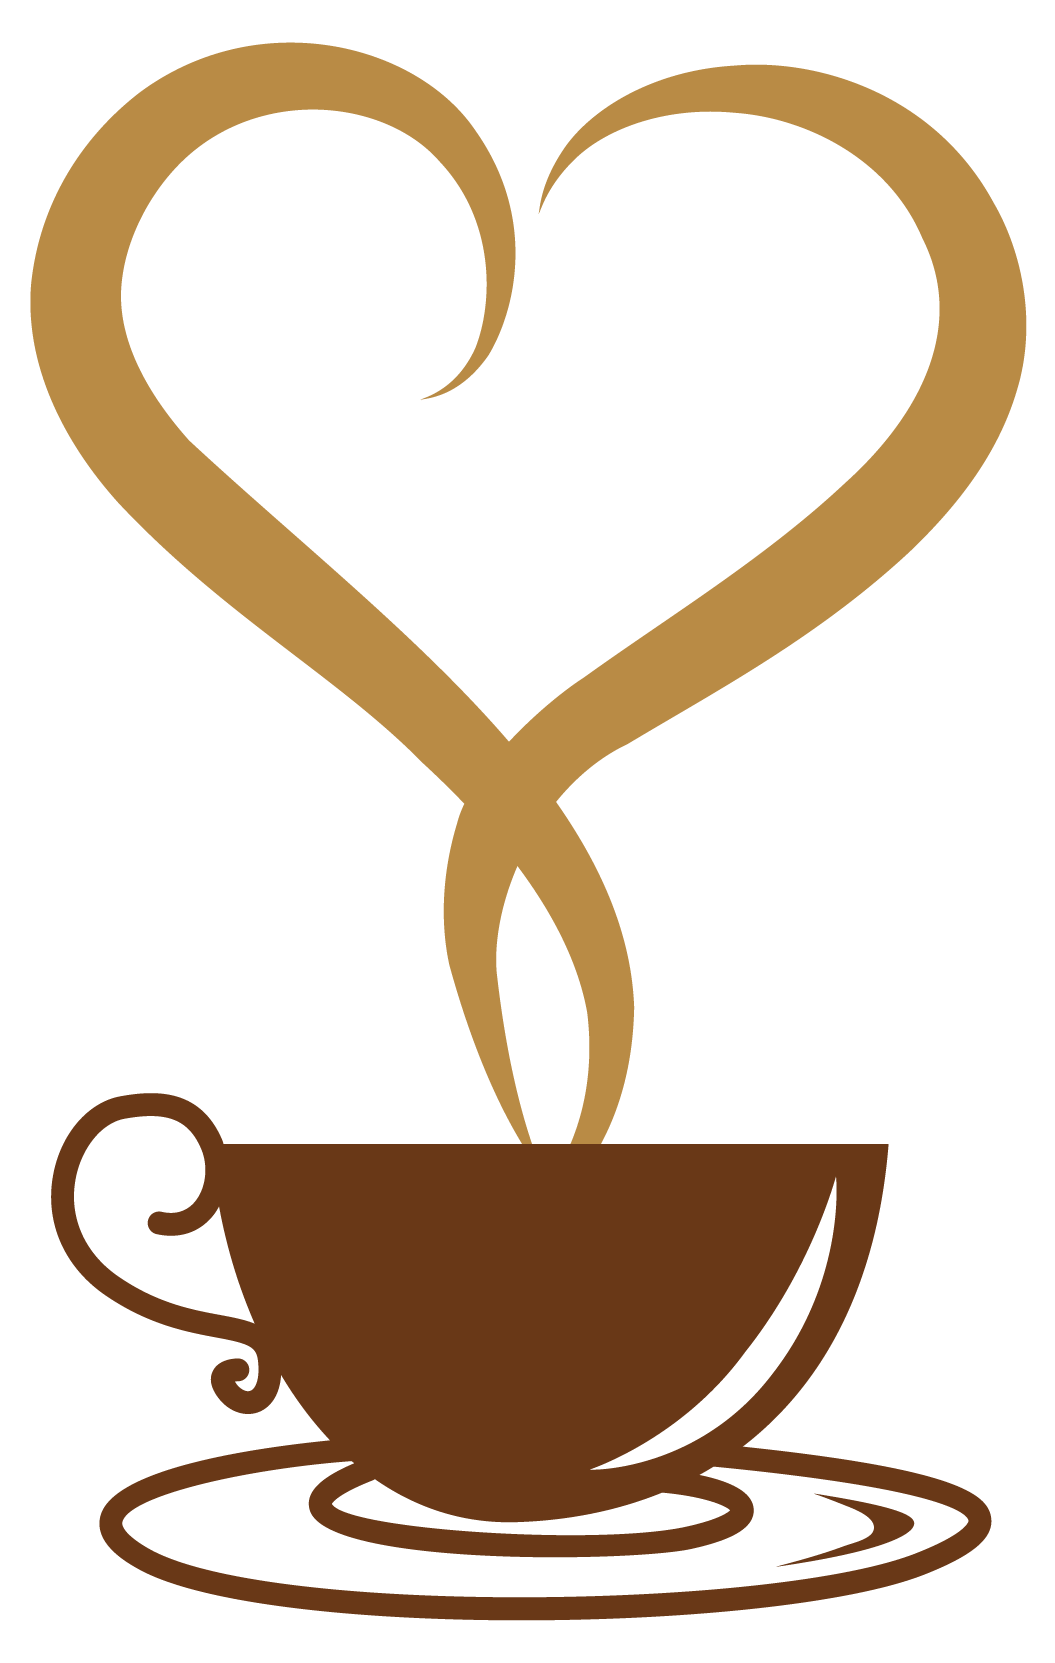 banner black and white download Coffee Mug With Heart PNG Transparent Coffee Mug With Heart